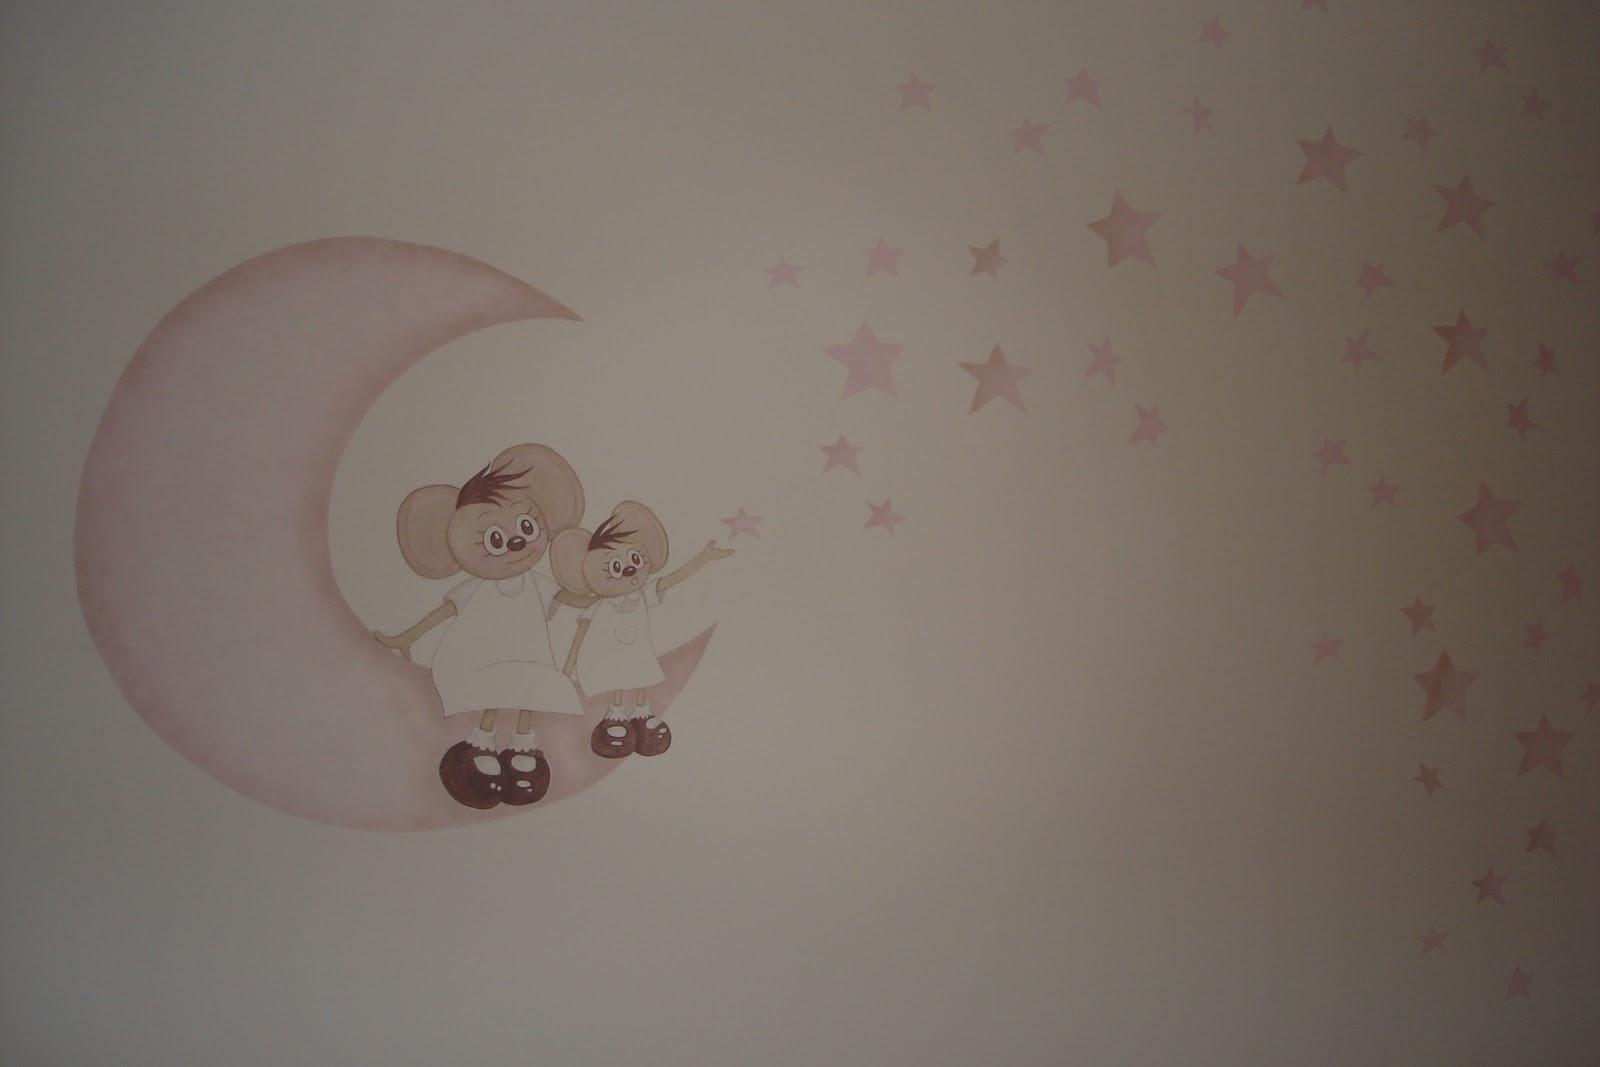 Aerografia y decoraci n habitaci n daniela - Dibujos paredes infantiles ...